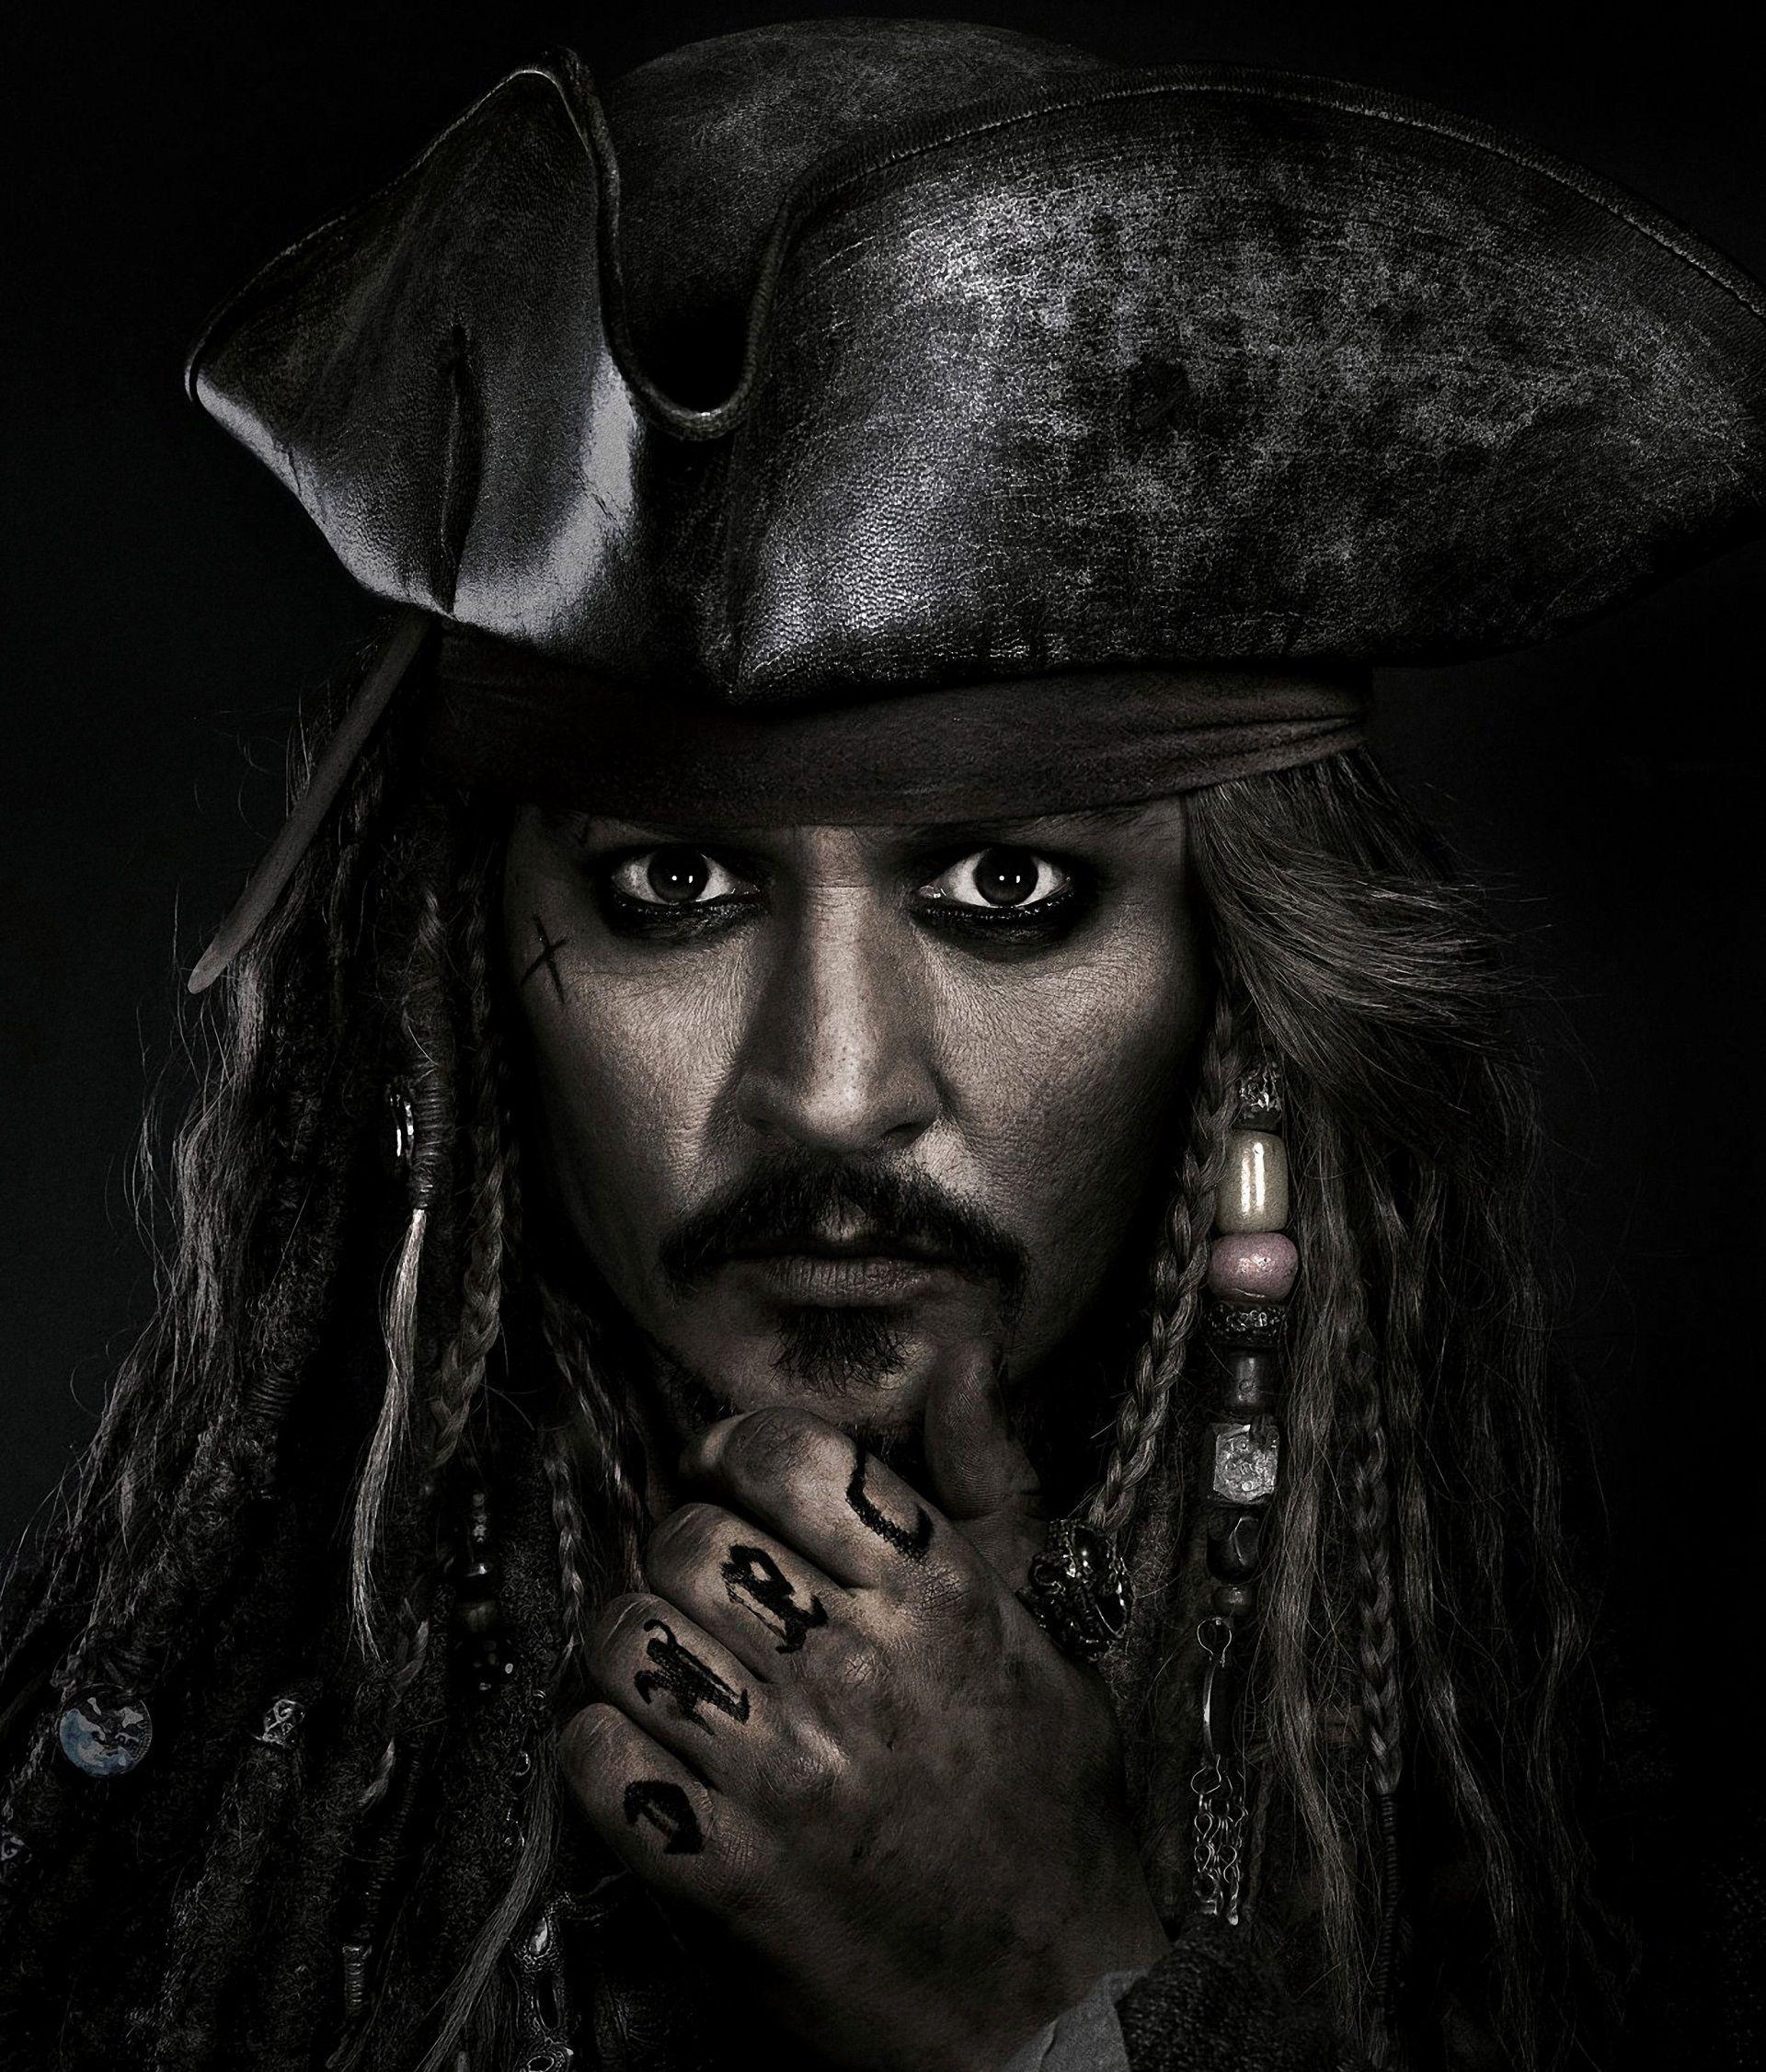 1920x2253 Johnny Depp Hd Wallpaper Download Free Captain Jack Sparrow Jack Sparrow Wallpaper Jack Sparrow